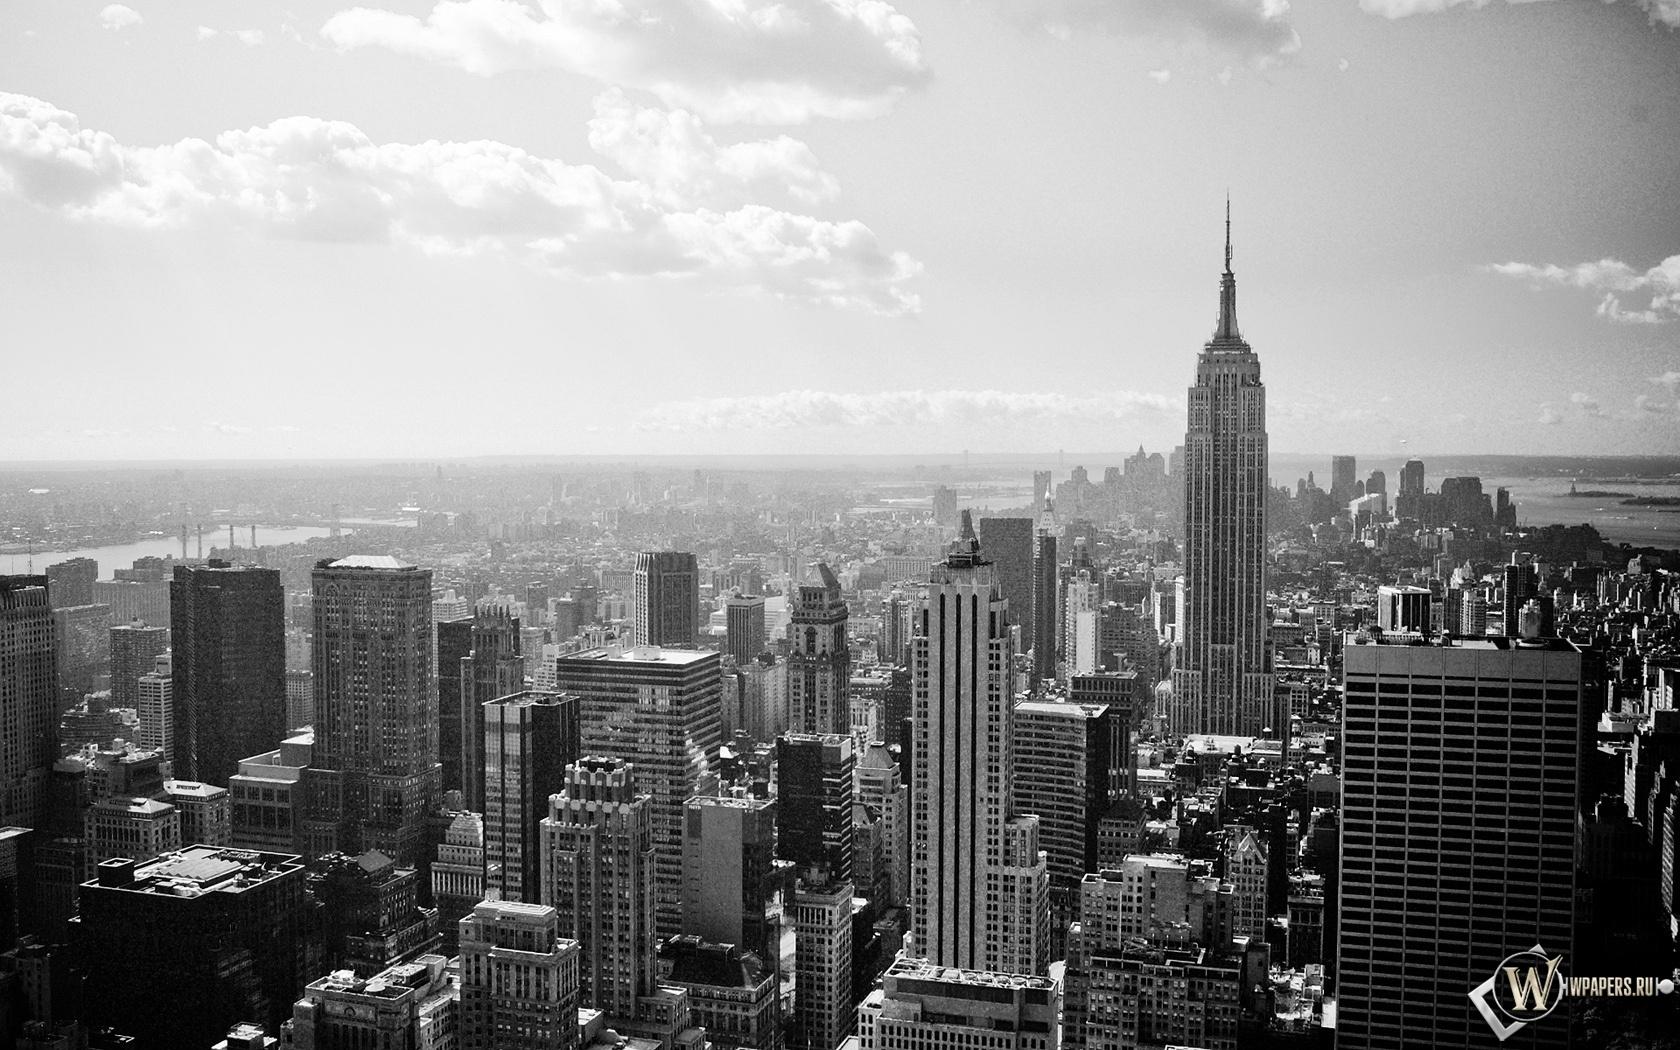 New-York black and white 1680x1050